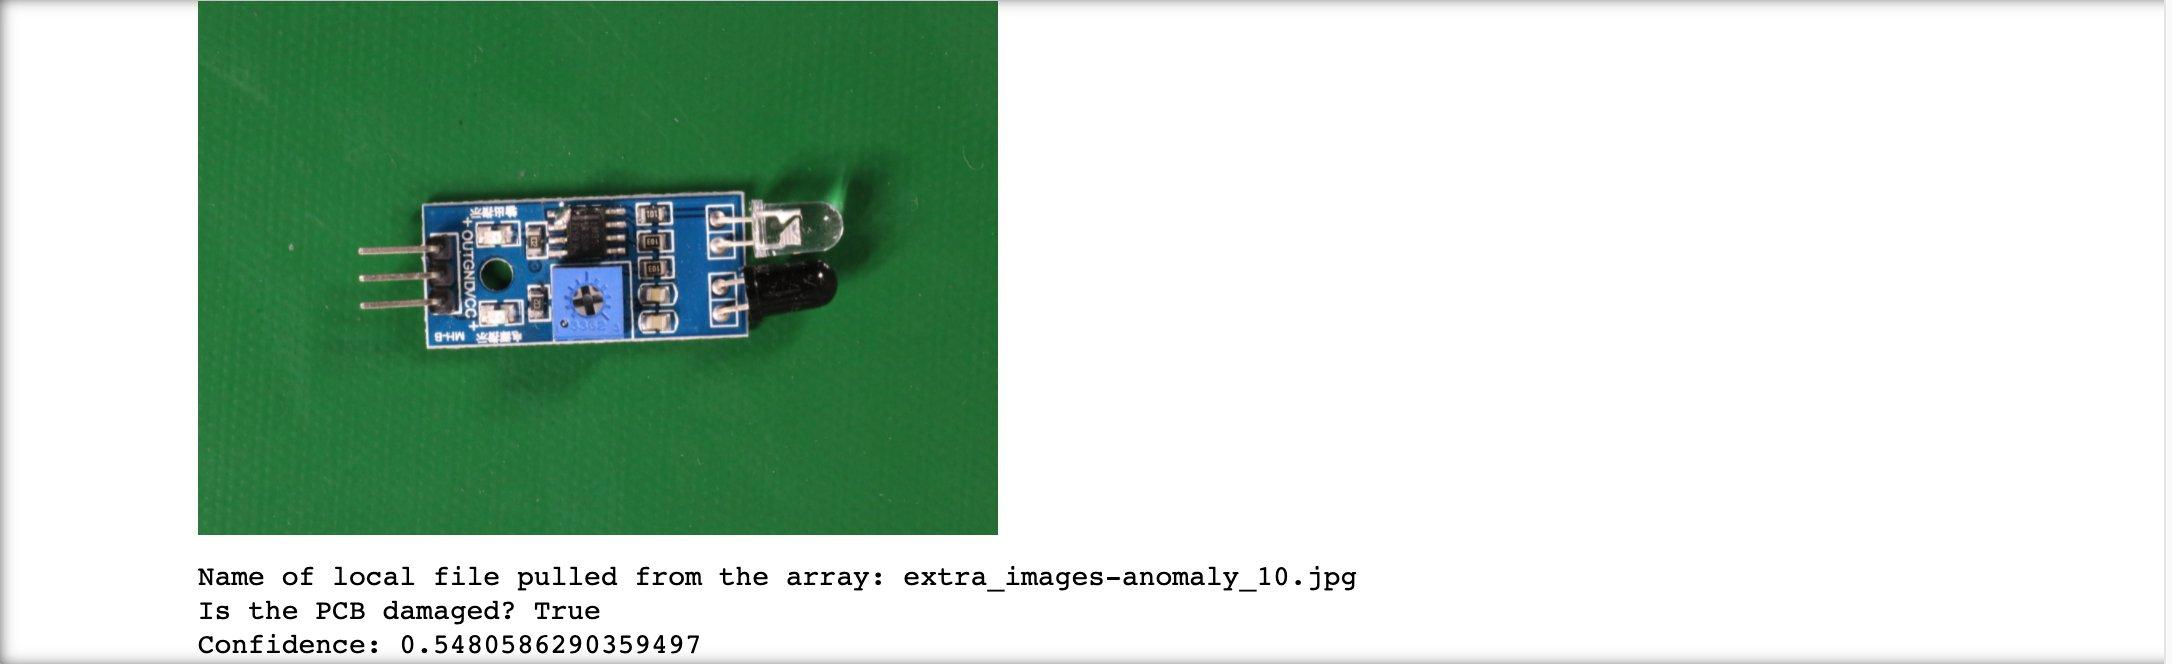 ML3802 image005